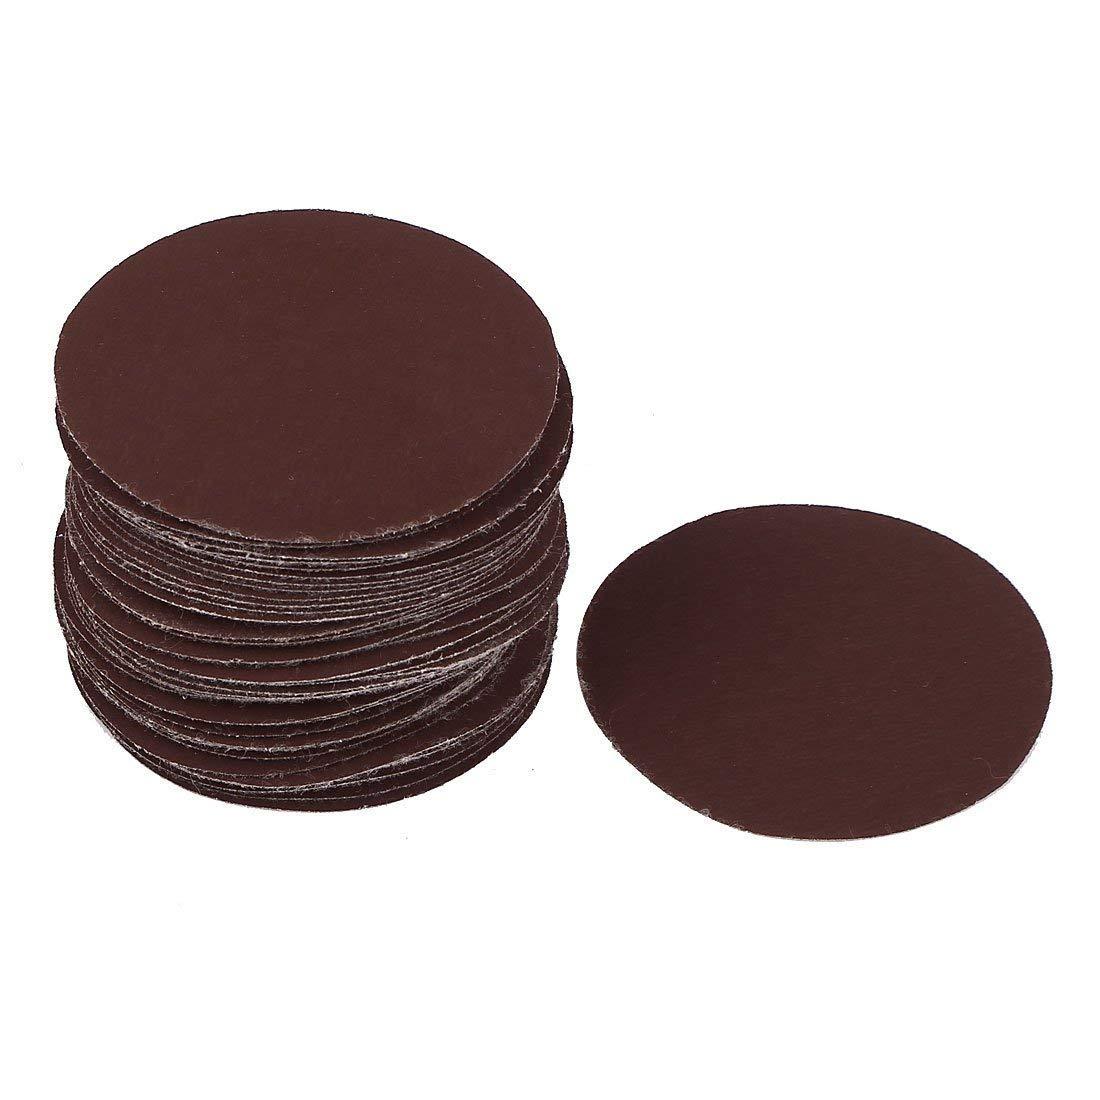 YXQ 3-inch Dia No-Hole 2000Grit Abrasive Round Sanding Disc Sandpaper (60Pcs)